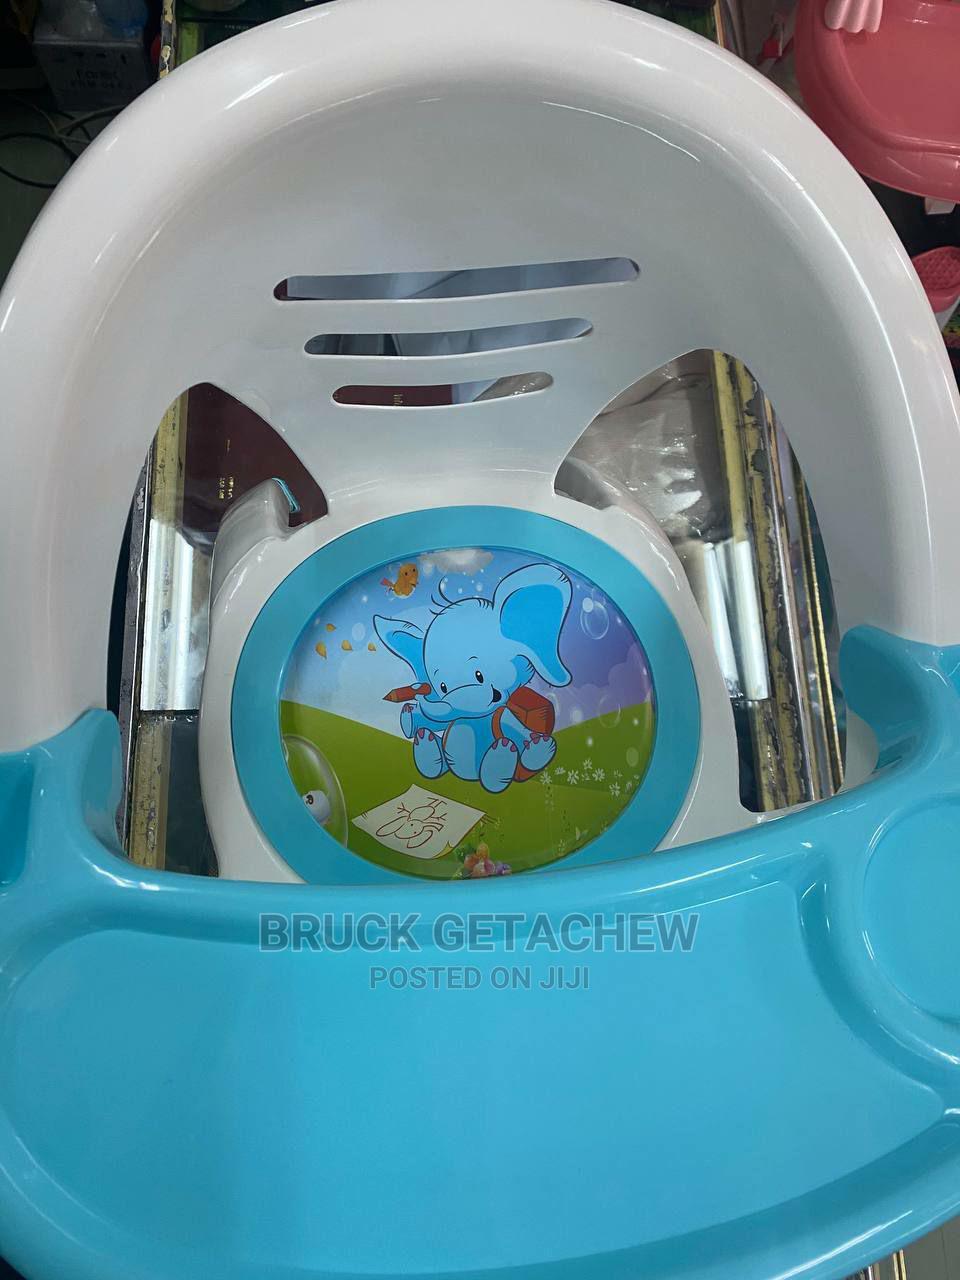 Baby Dinning Chair የህፃናት መመገቢያ ወንበር ከነጠረጰዛ | Children's Furniture for sale in Yeka, Addis Ababa, Ethiopia